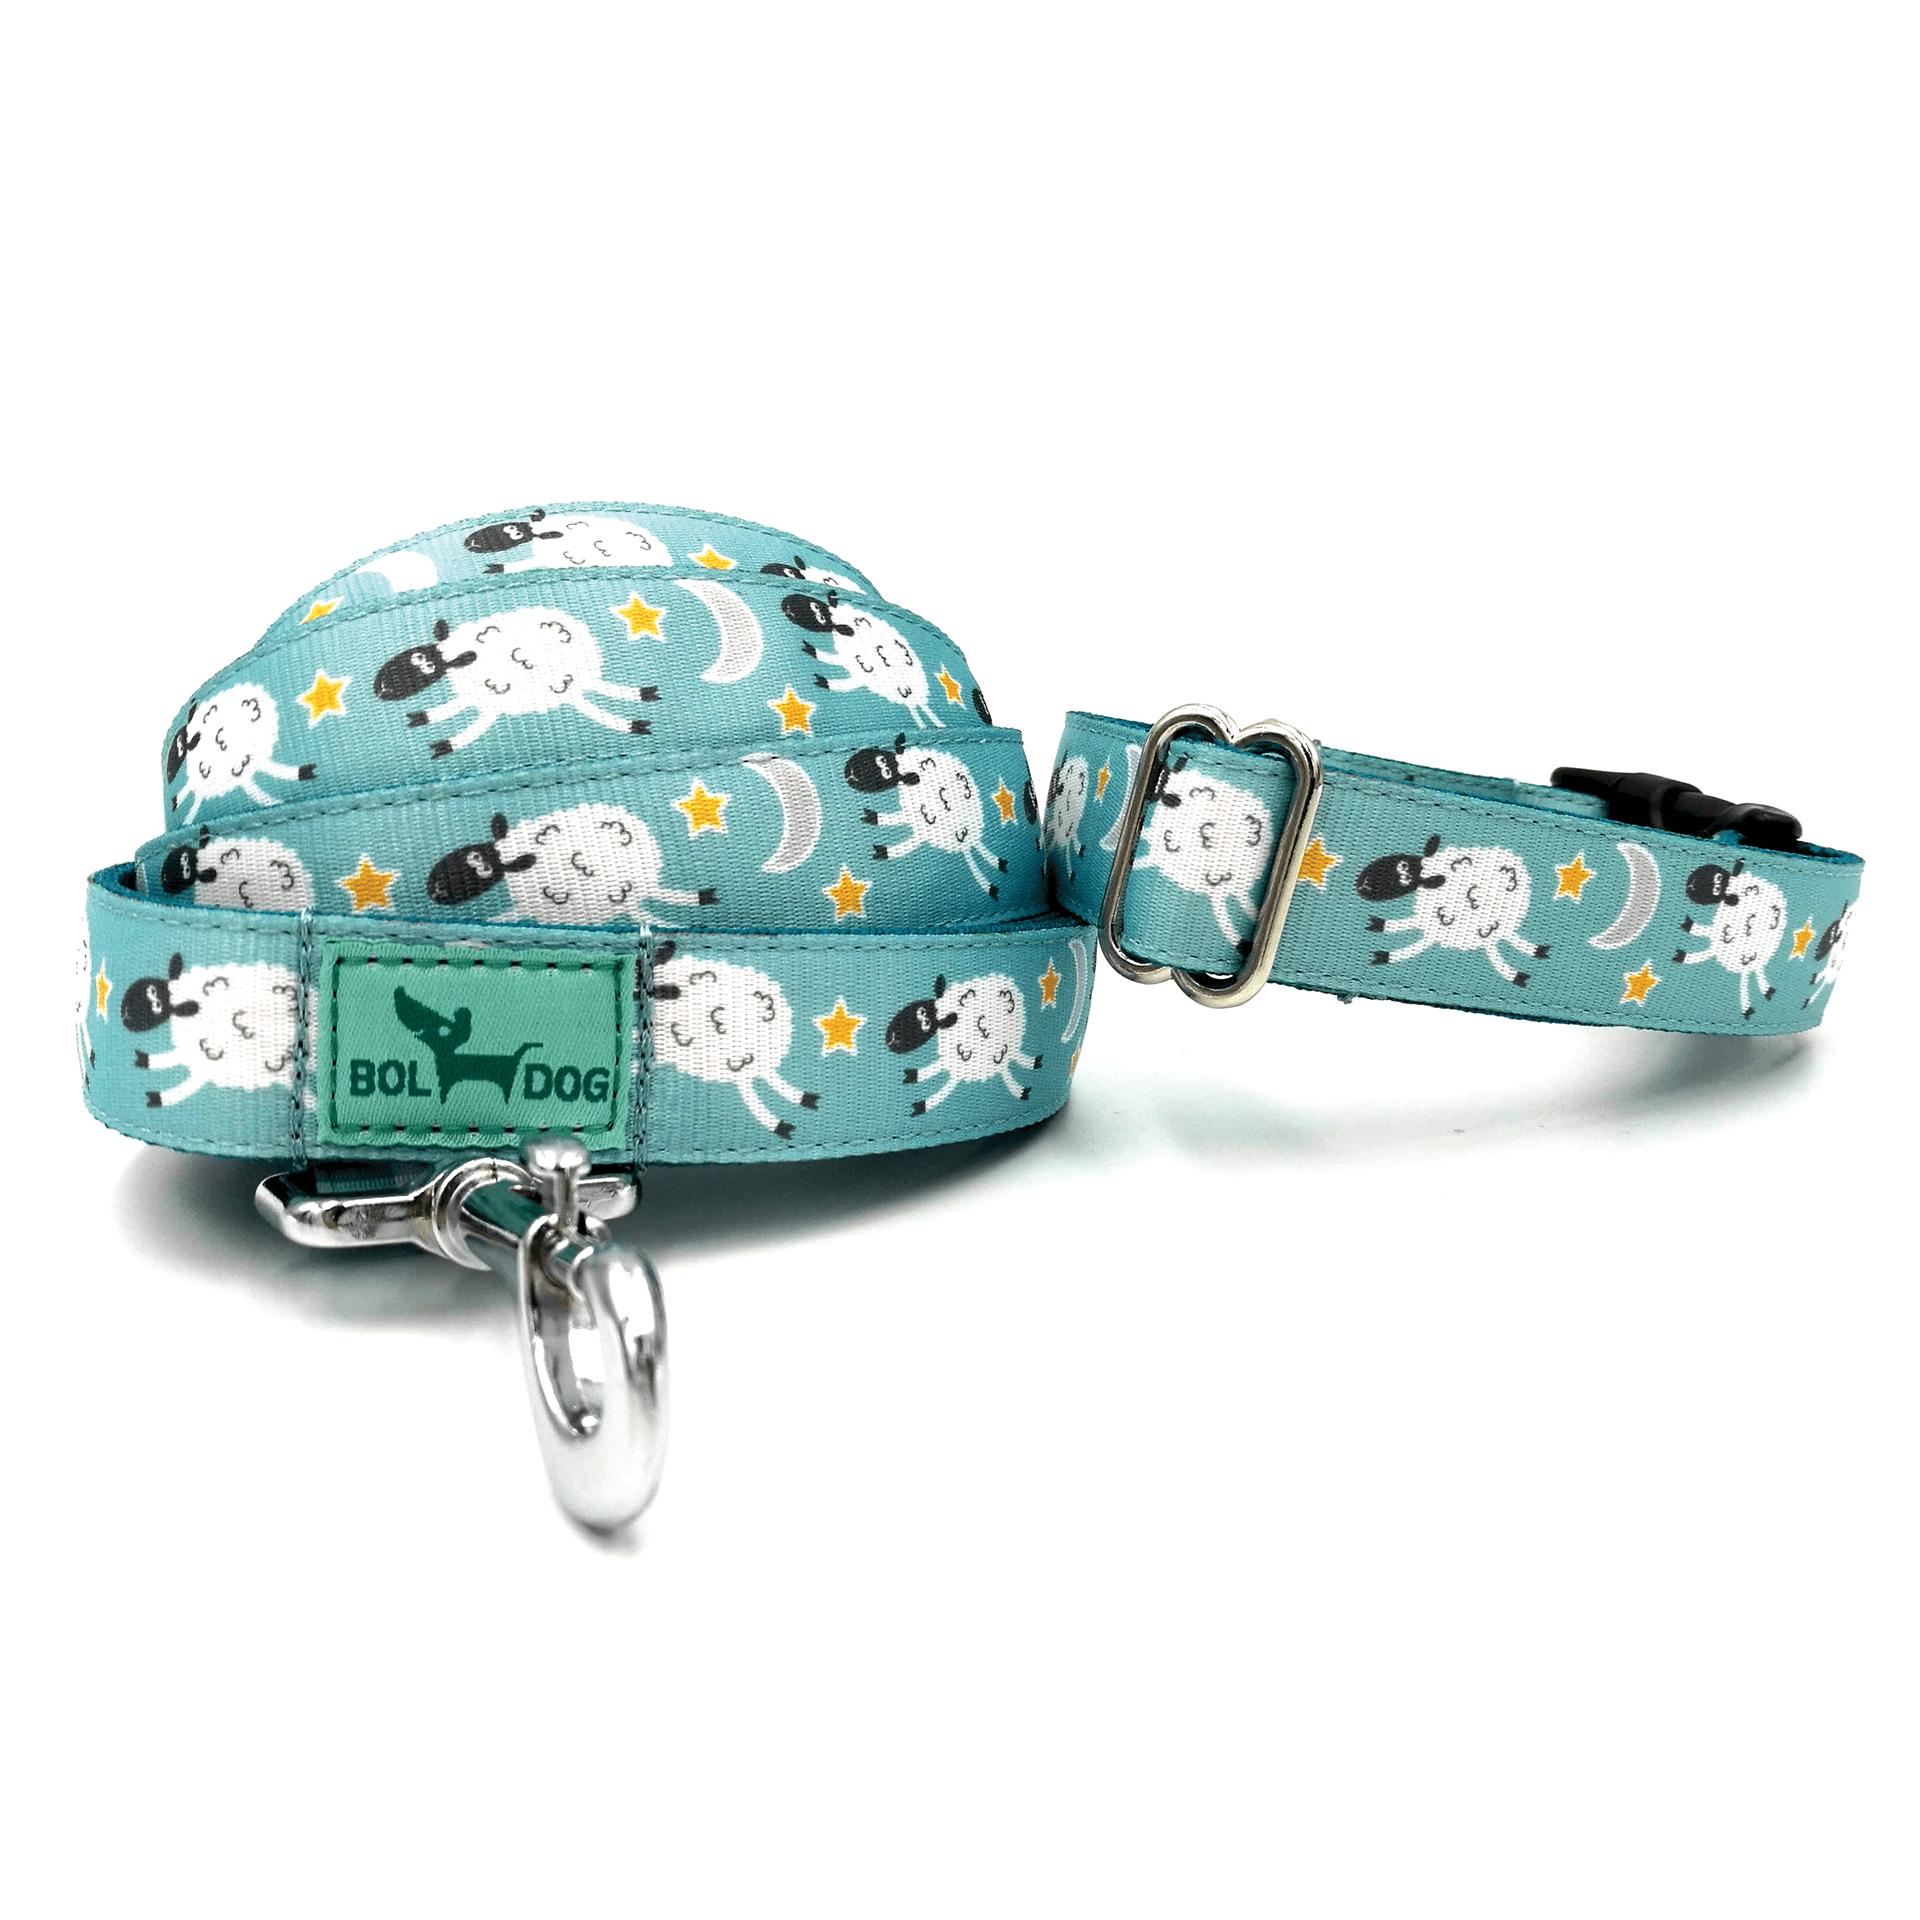 sheep pattern dog collar and leash